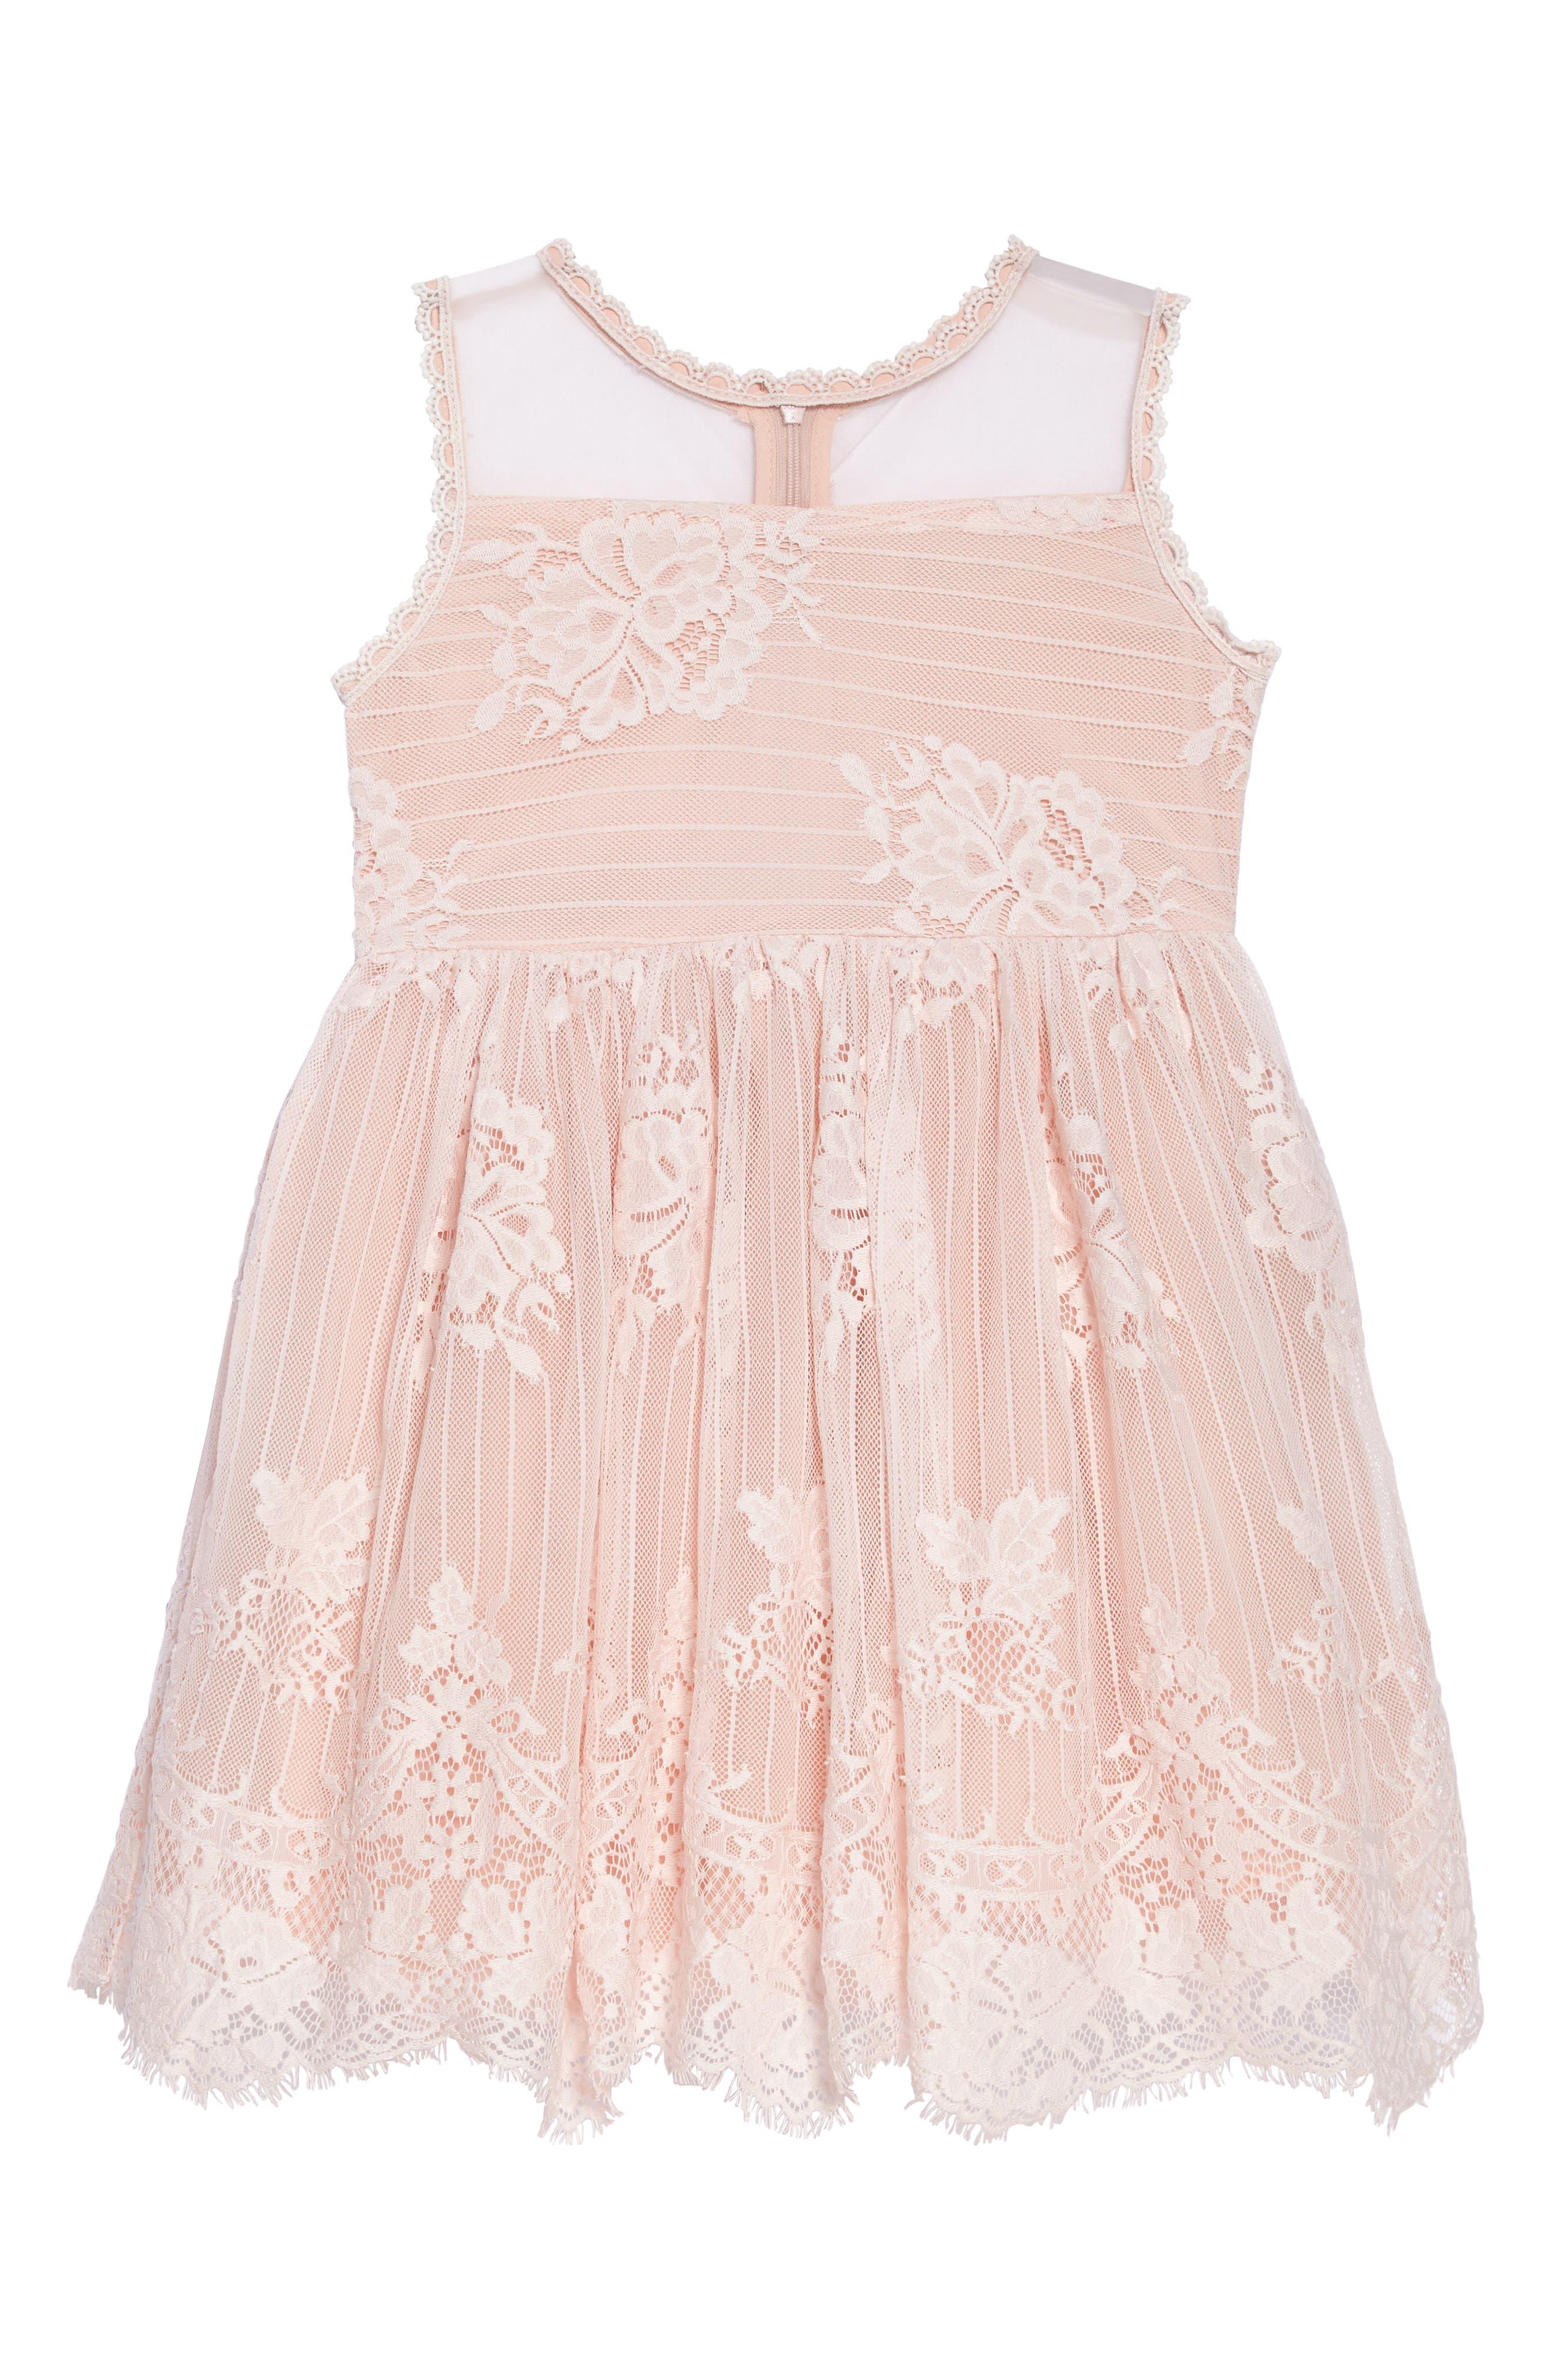 Doe A Dear Lace Fit & Flare Dress (Toddler Girls, Little Girls & Big Girls)